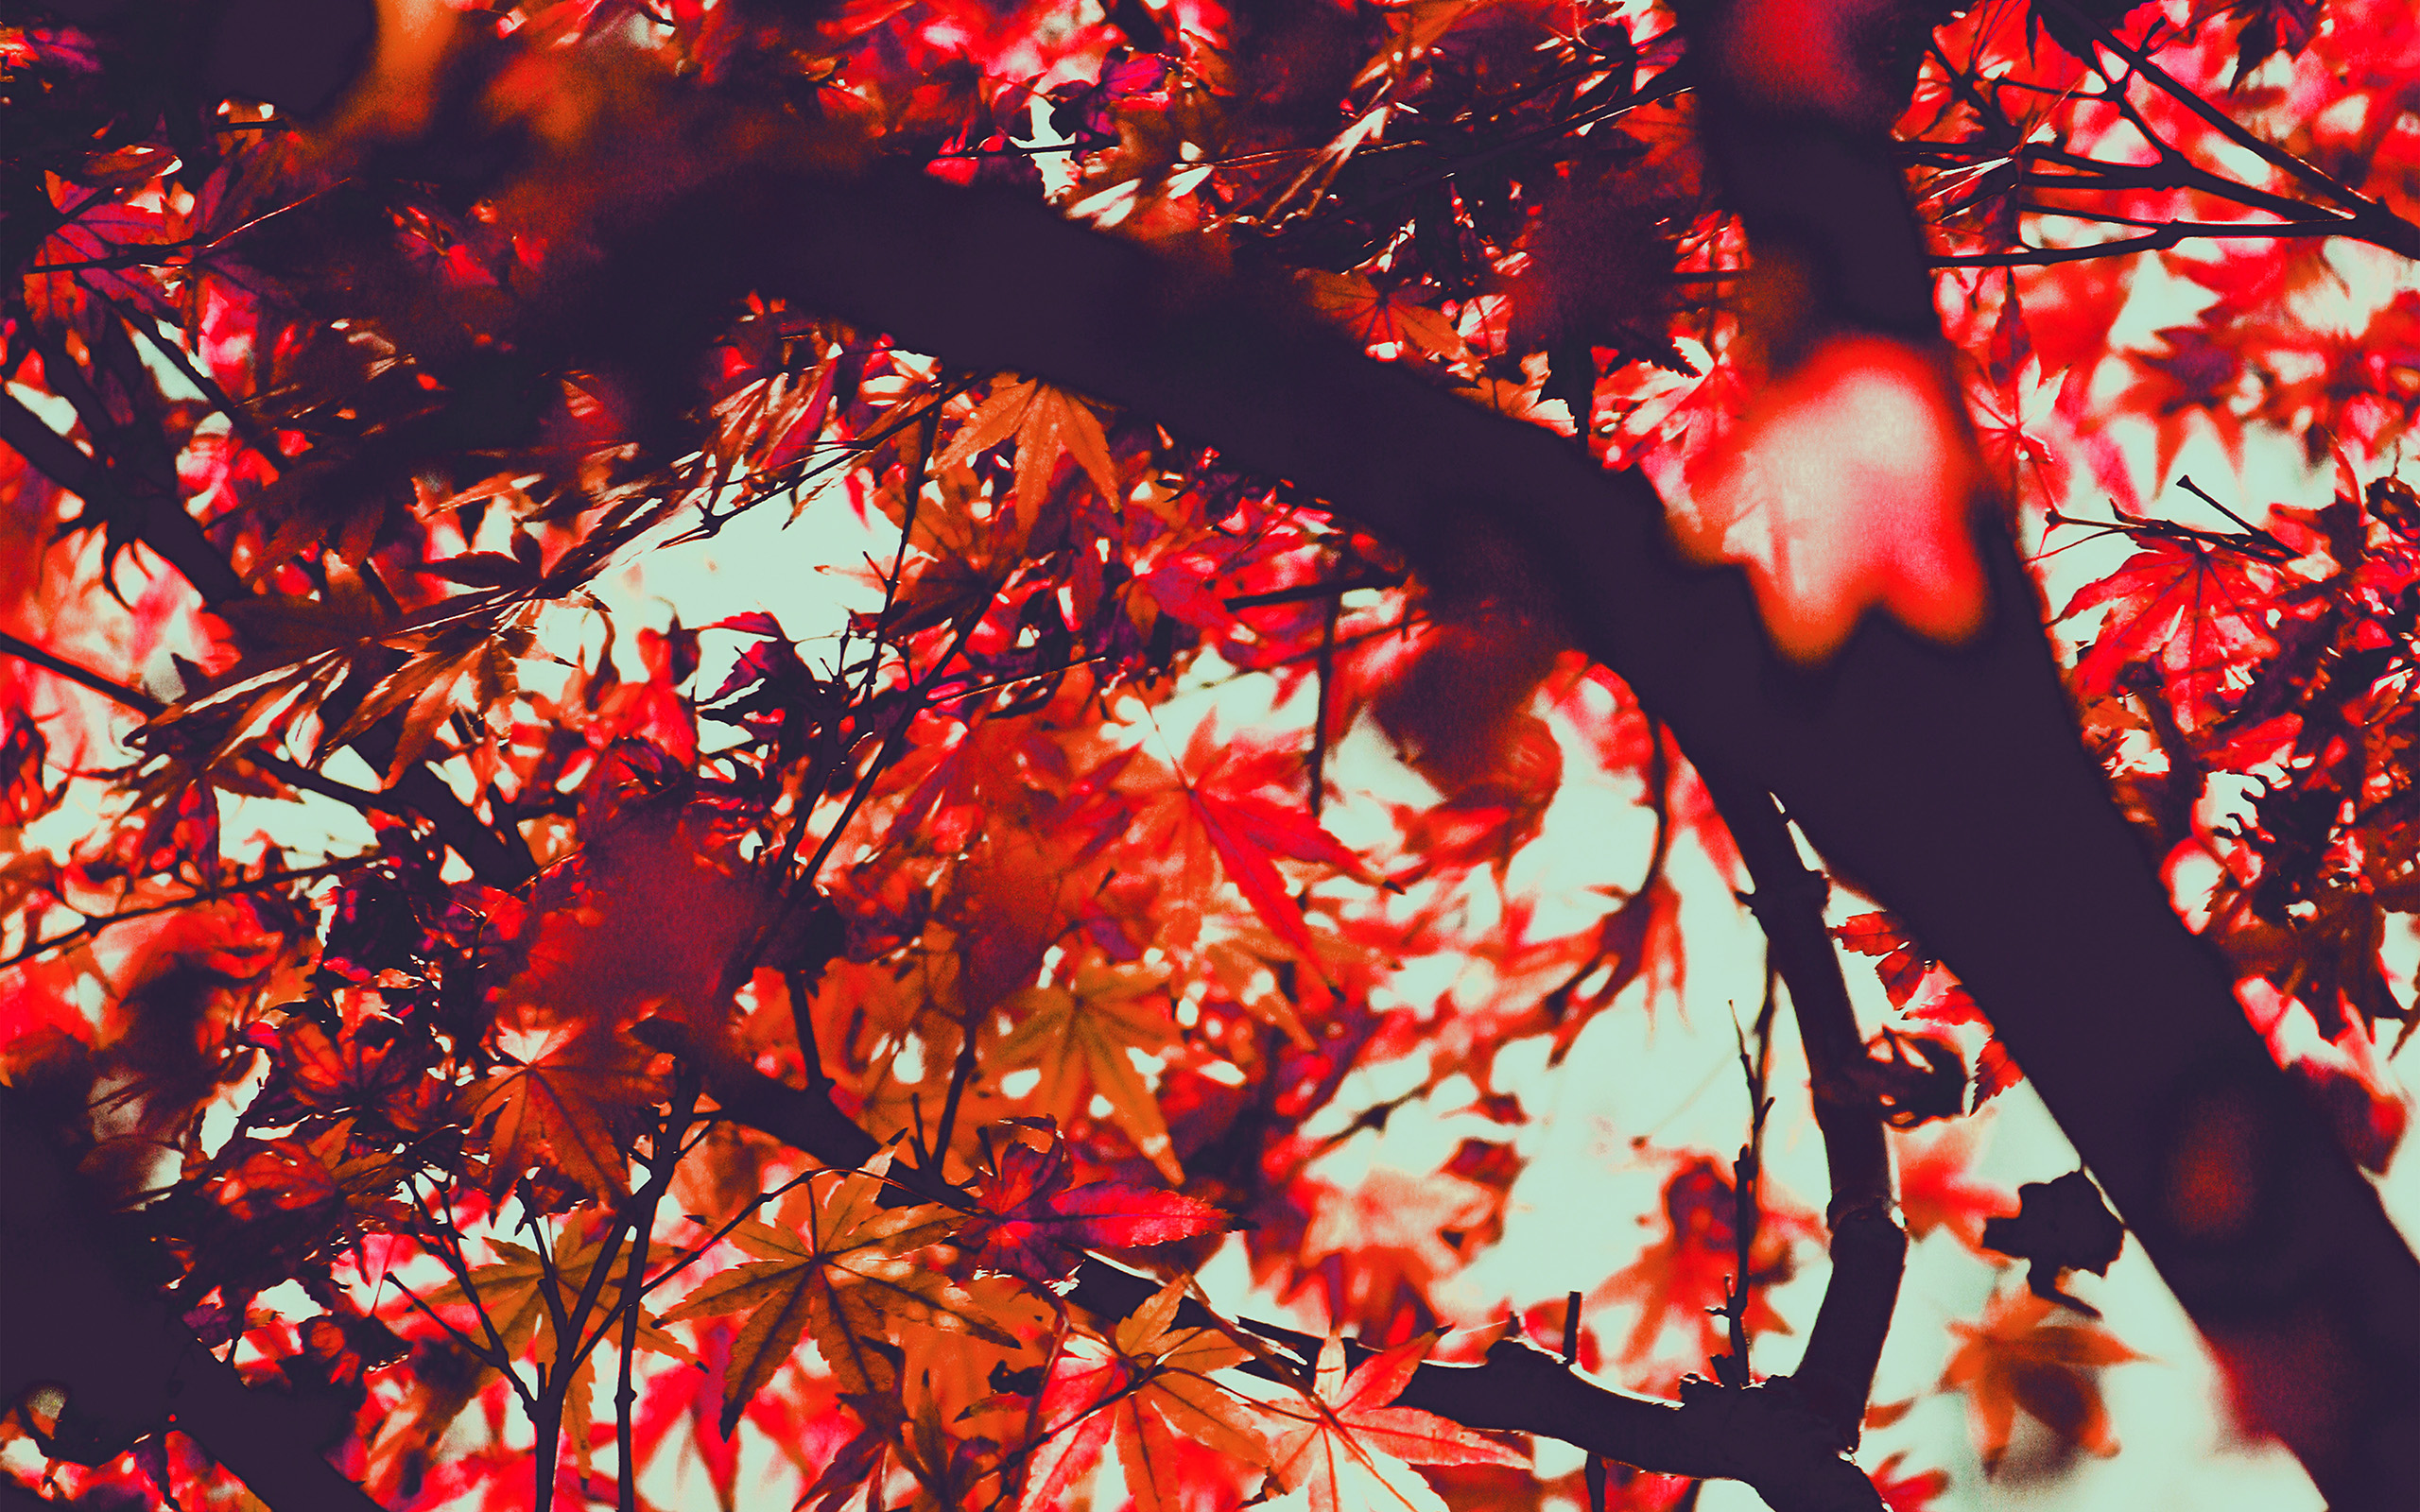 Fall Wallpaper For Laptops Wallpaper For Desktop Laptop Mx13 Fall Tree Leaf Autumn